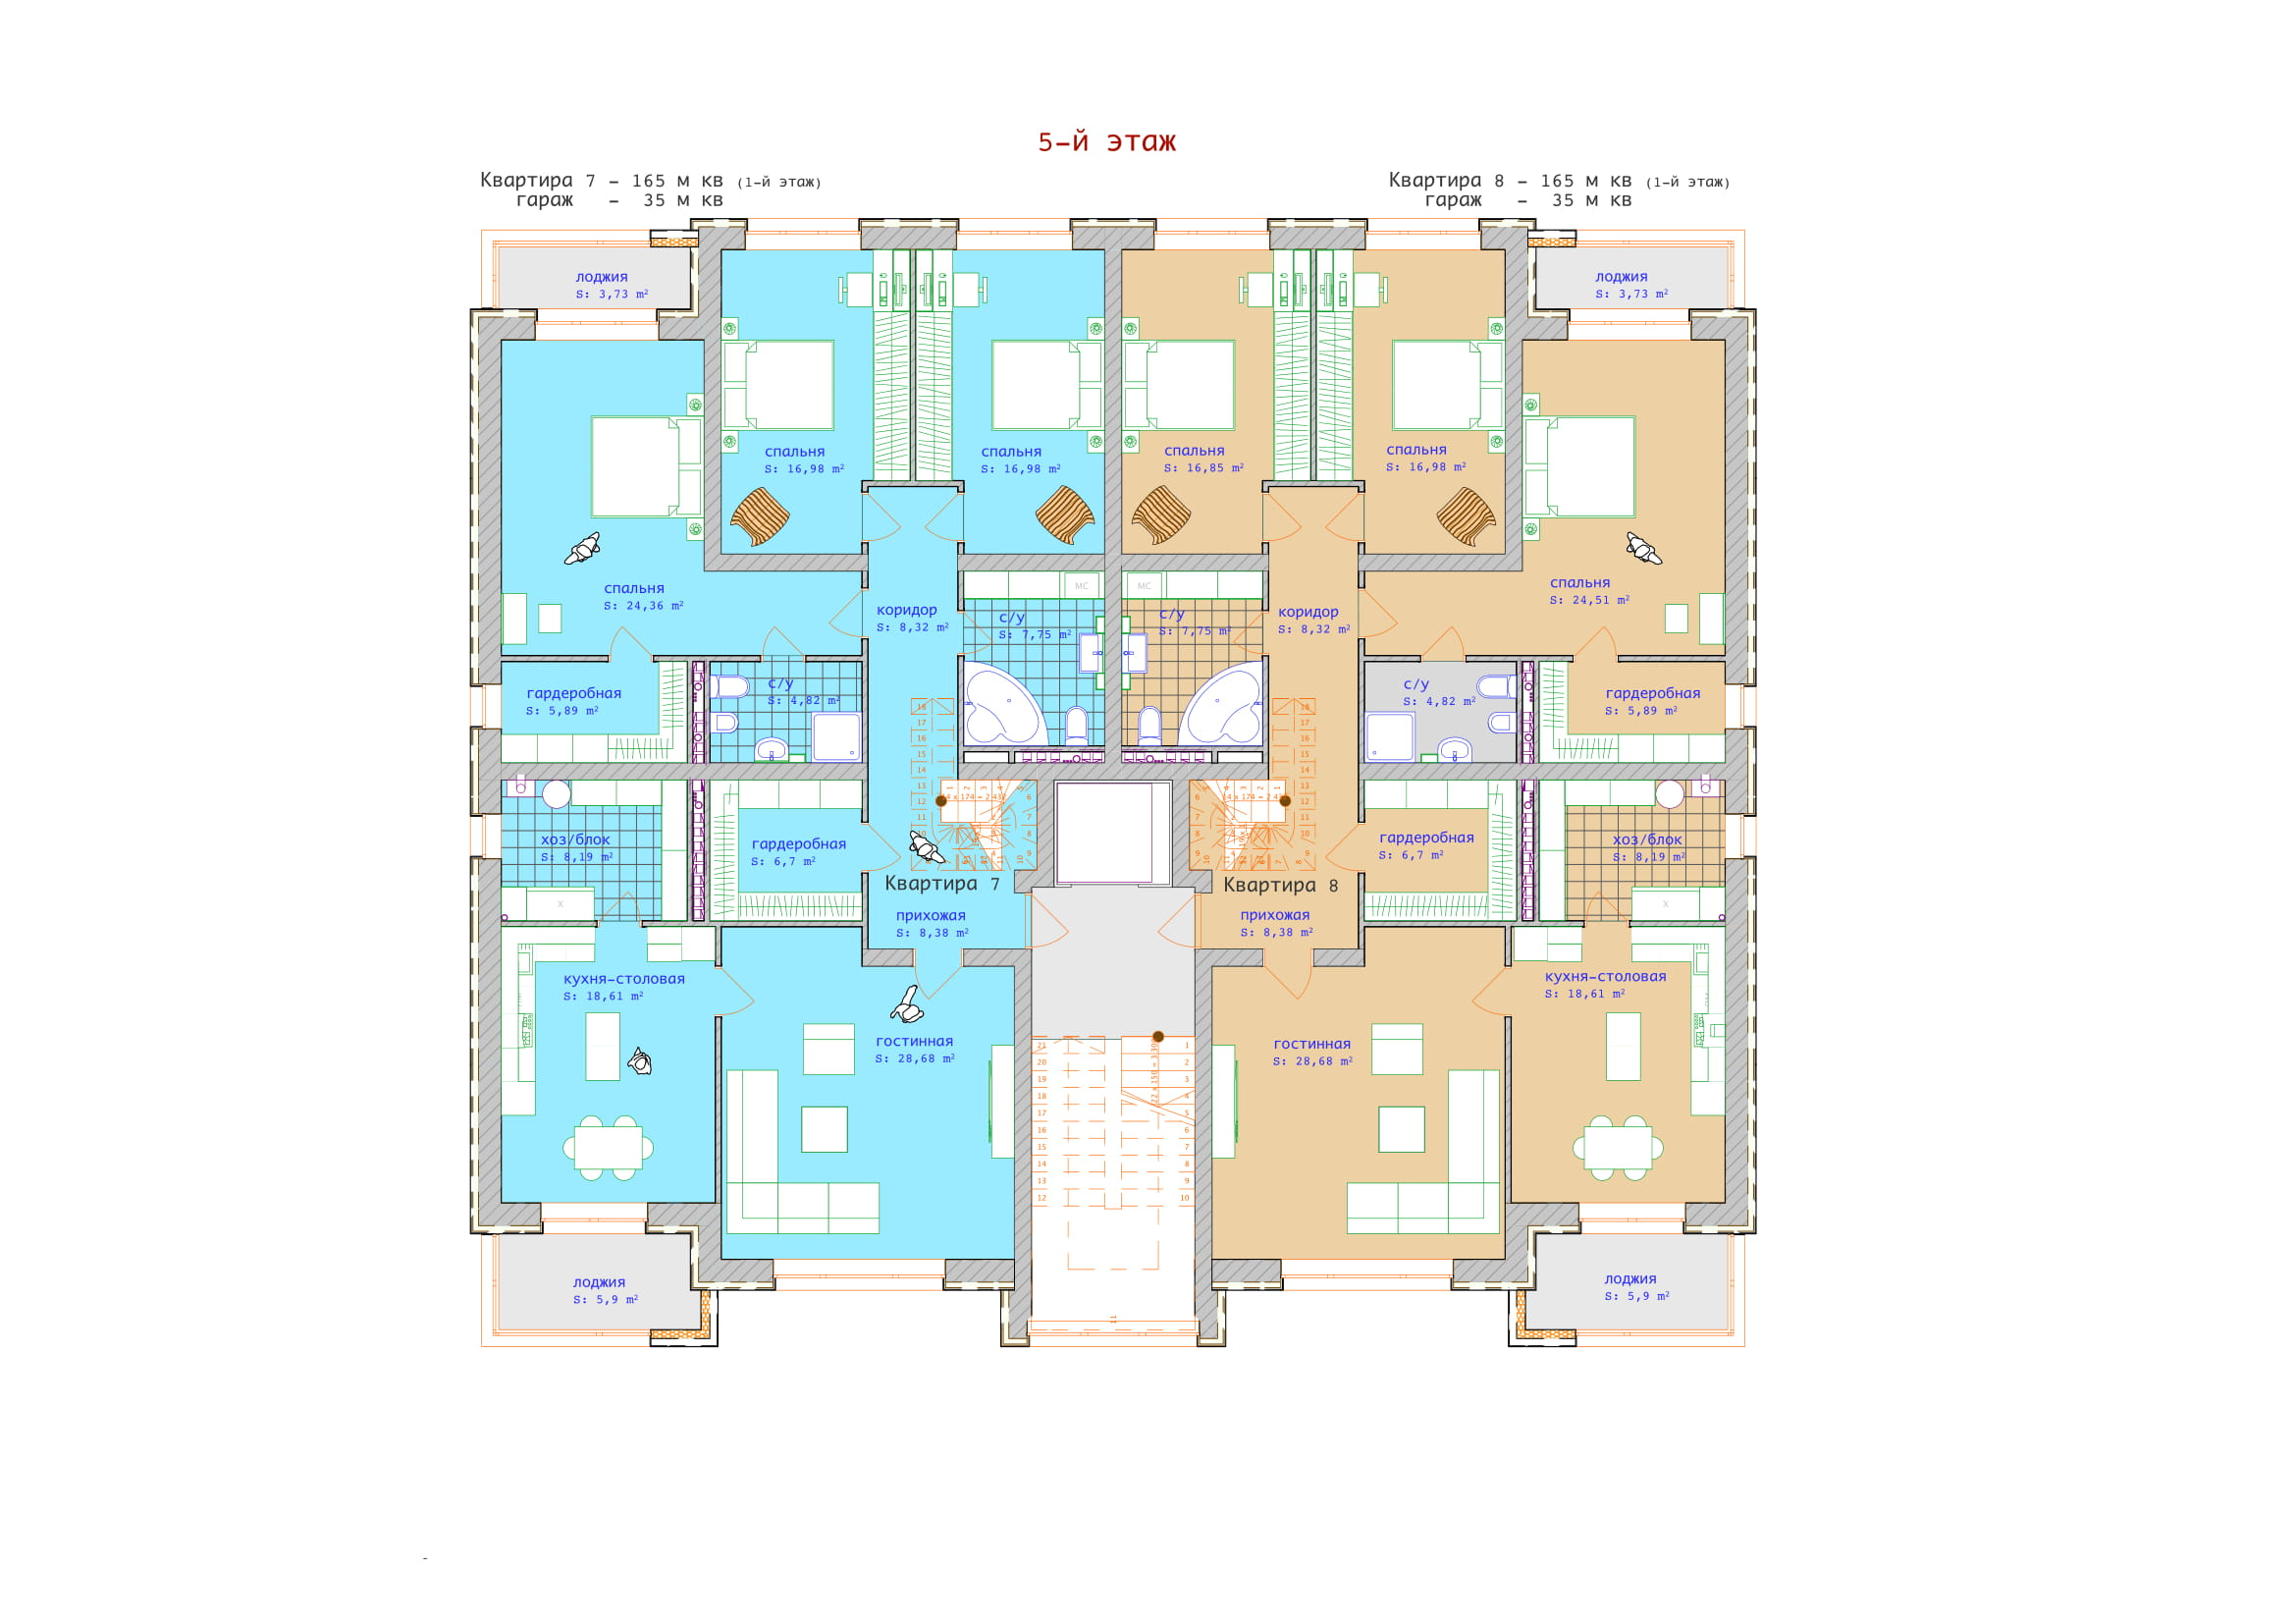 Penthouse 1st floor